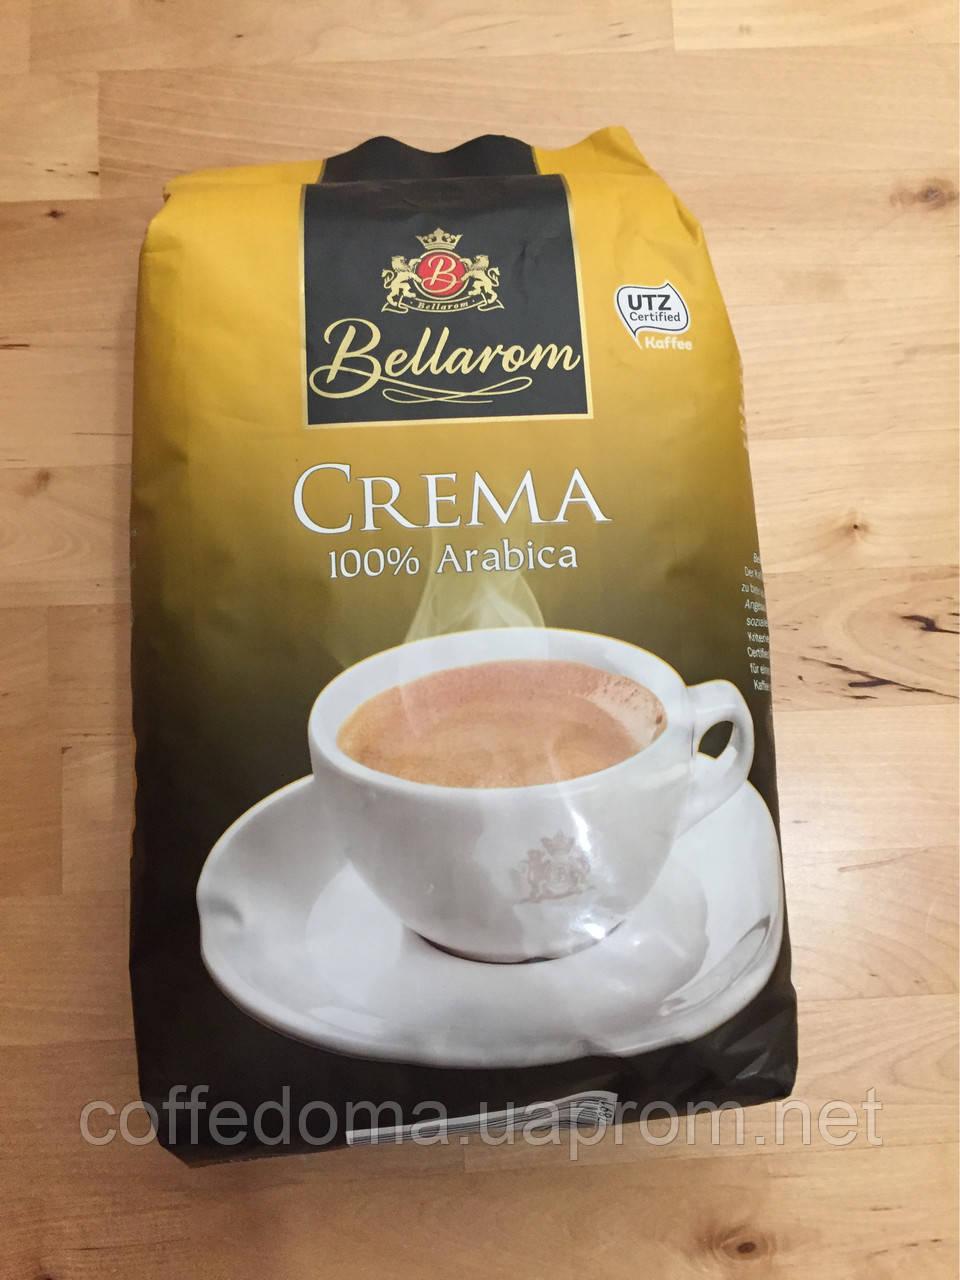 Bellarom Crema Arabica кофе в зернах